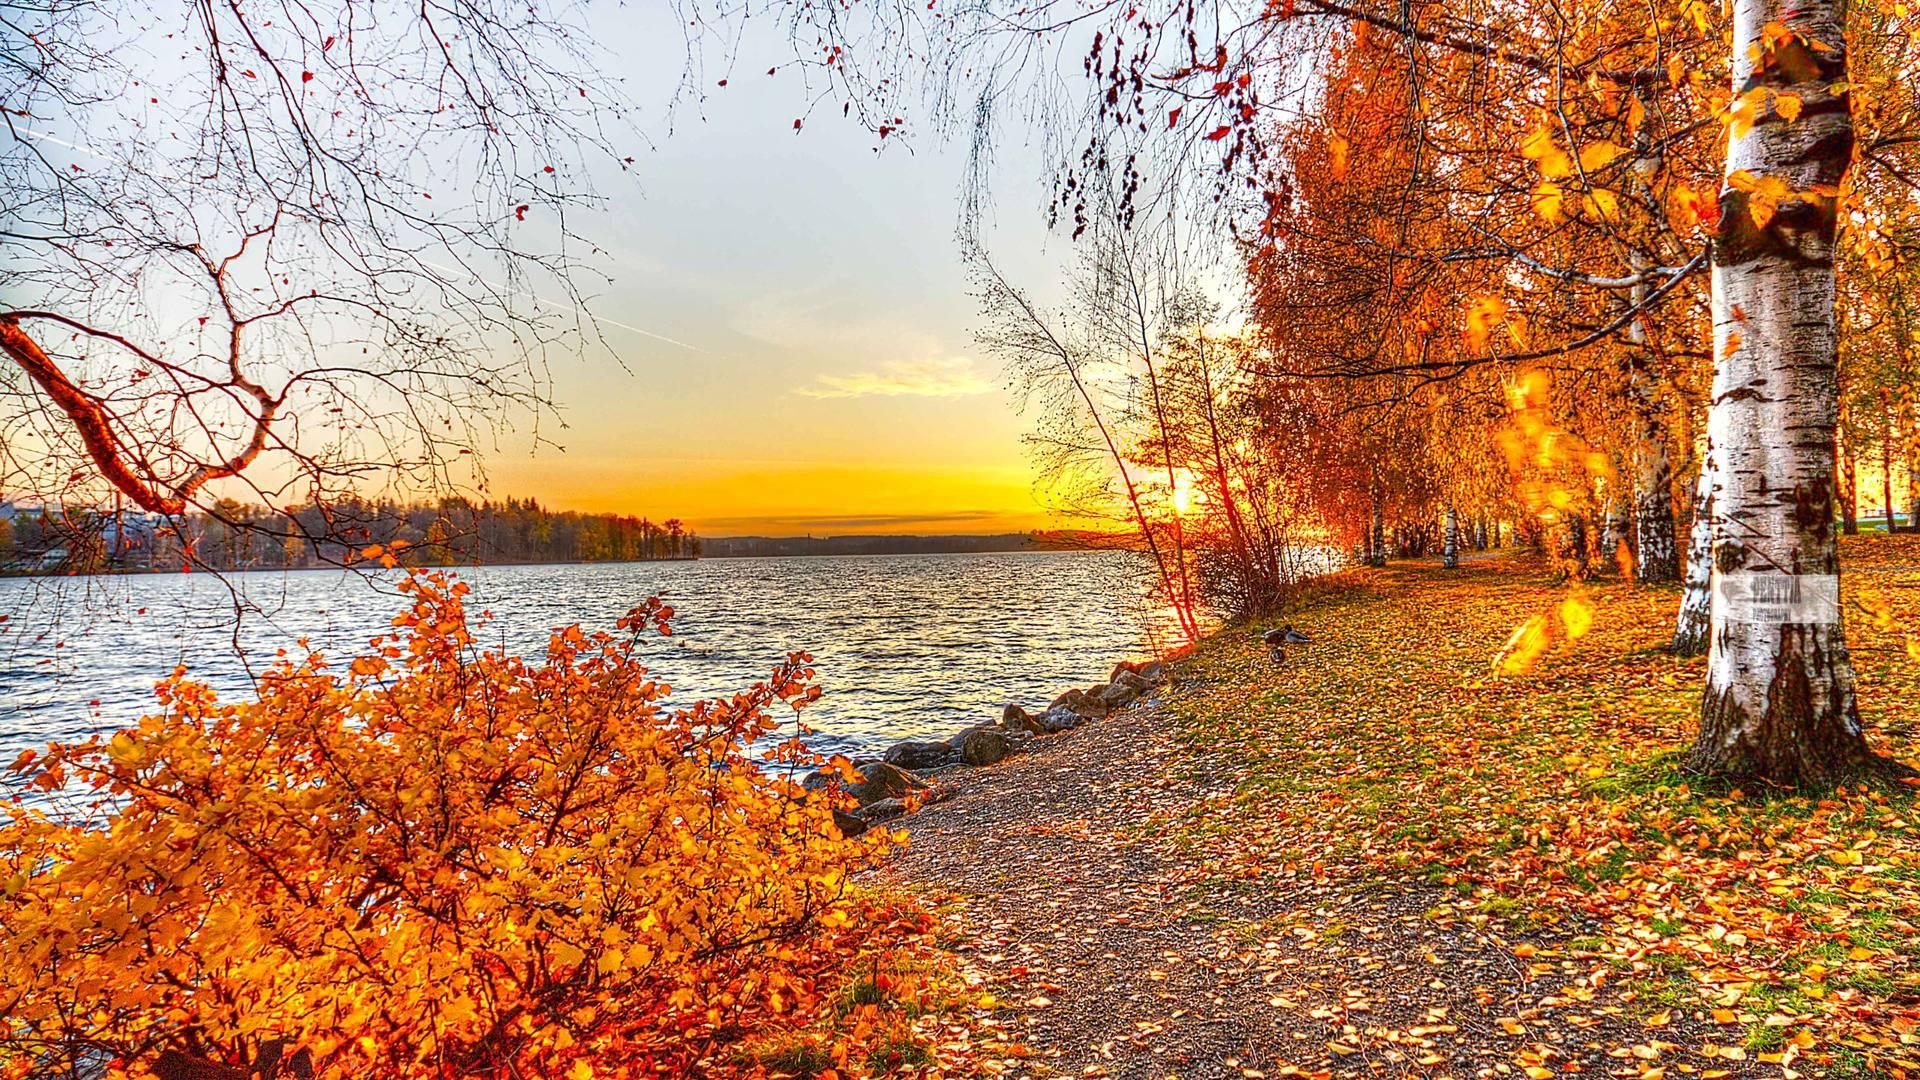 64 Autumn Wallpapers For Desktop On Wallpapersafari